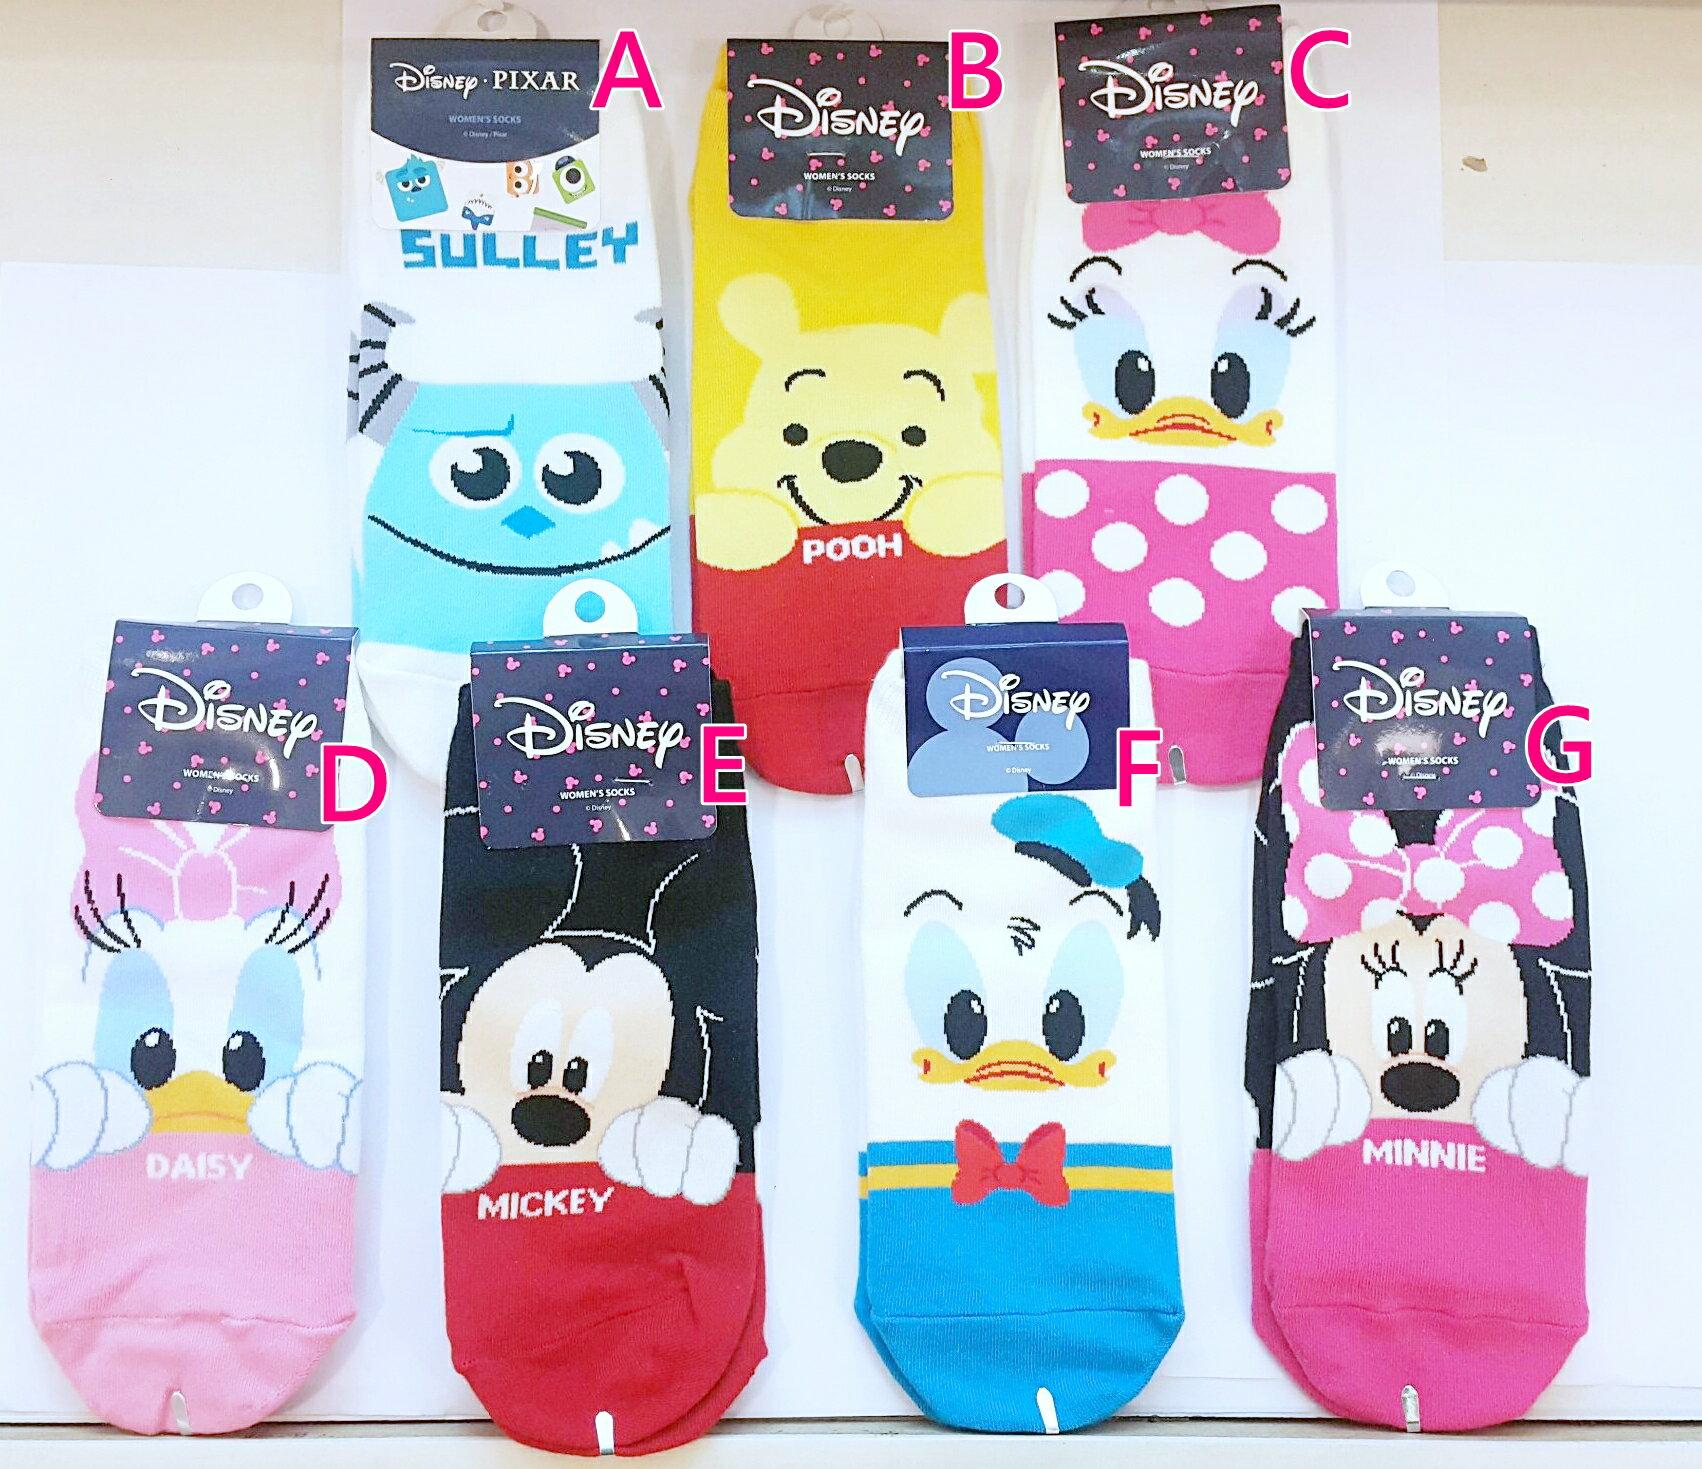 X射線【C190003】Disney 好朋友系列短襪(22-25cm)7款選1,大人/小孩短襪/船型襪/sanrio卡通/襪子